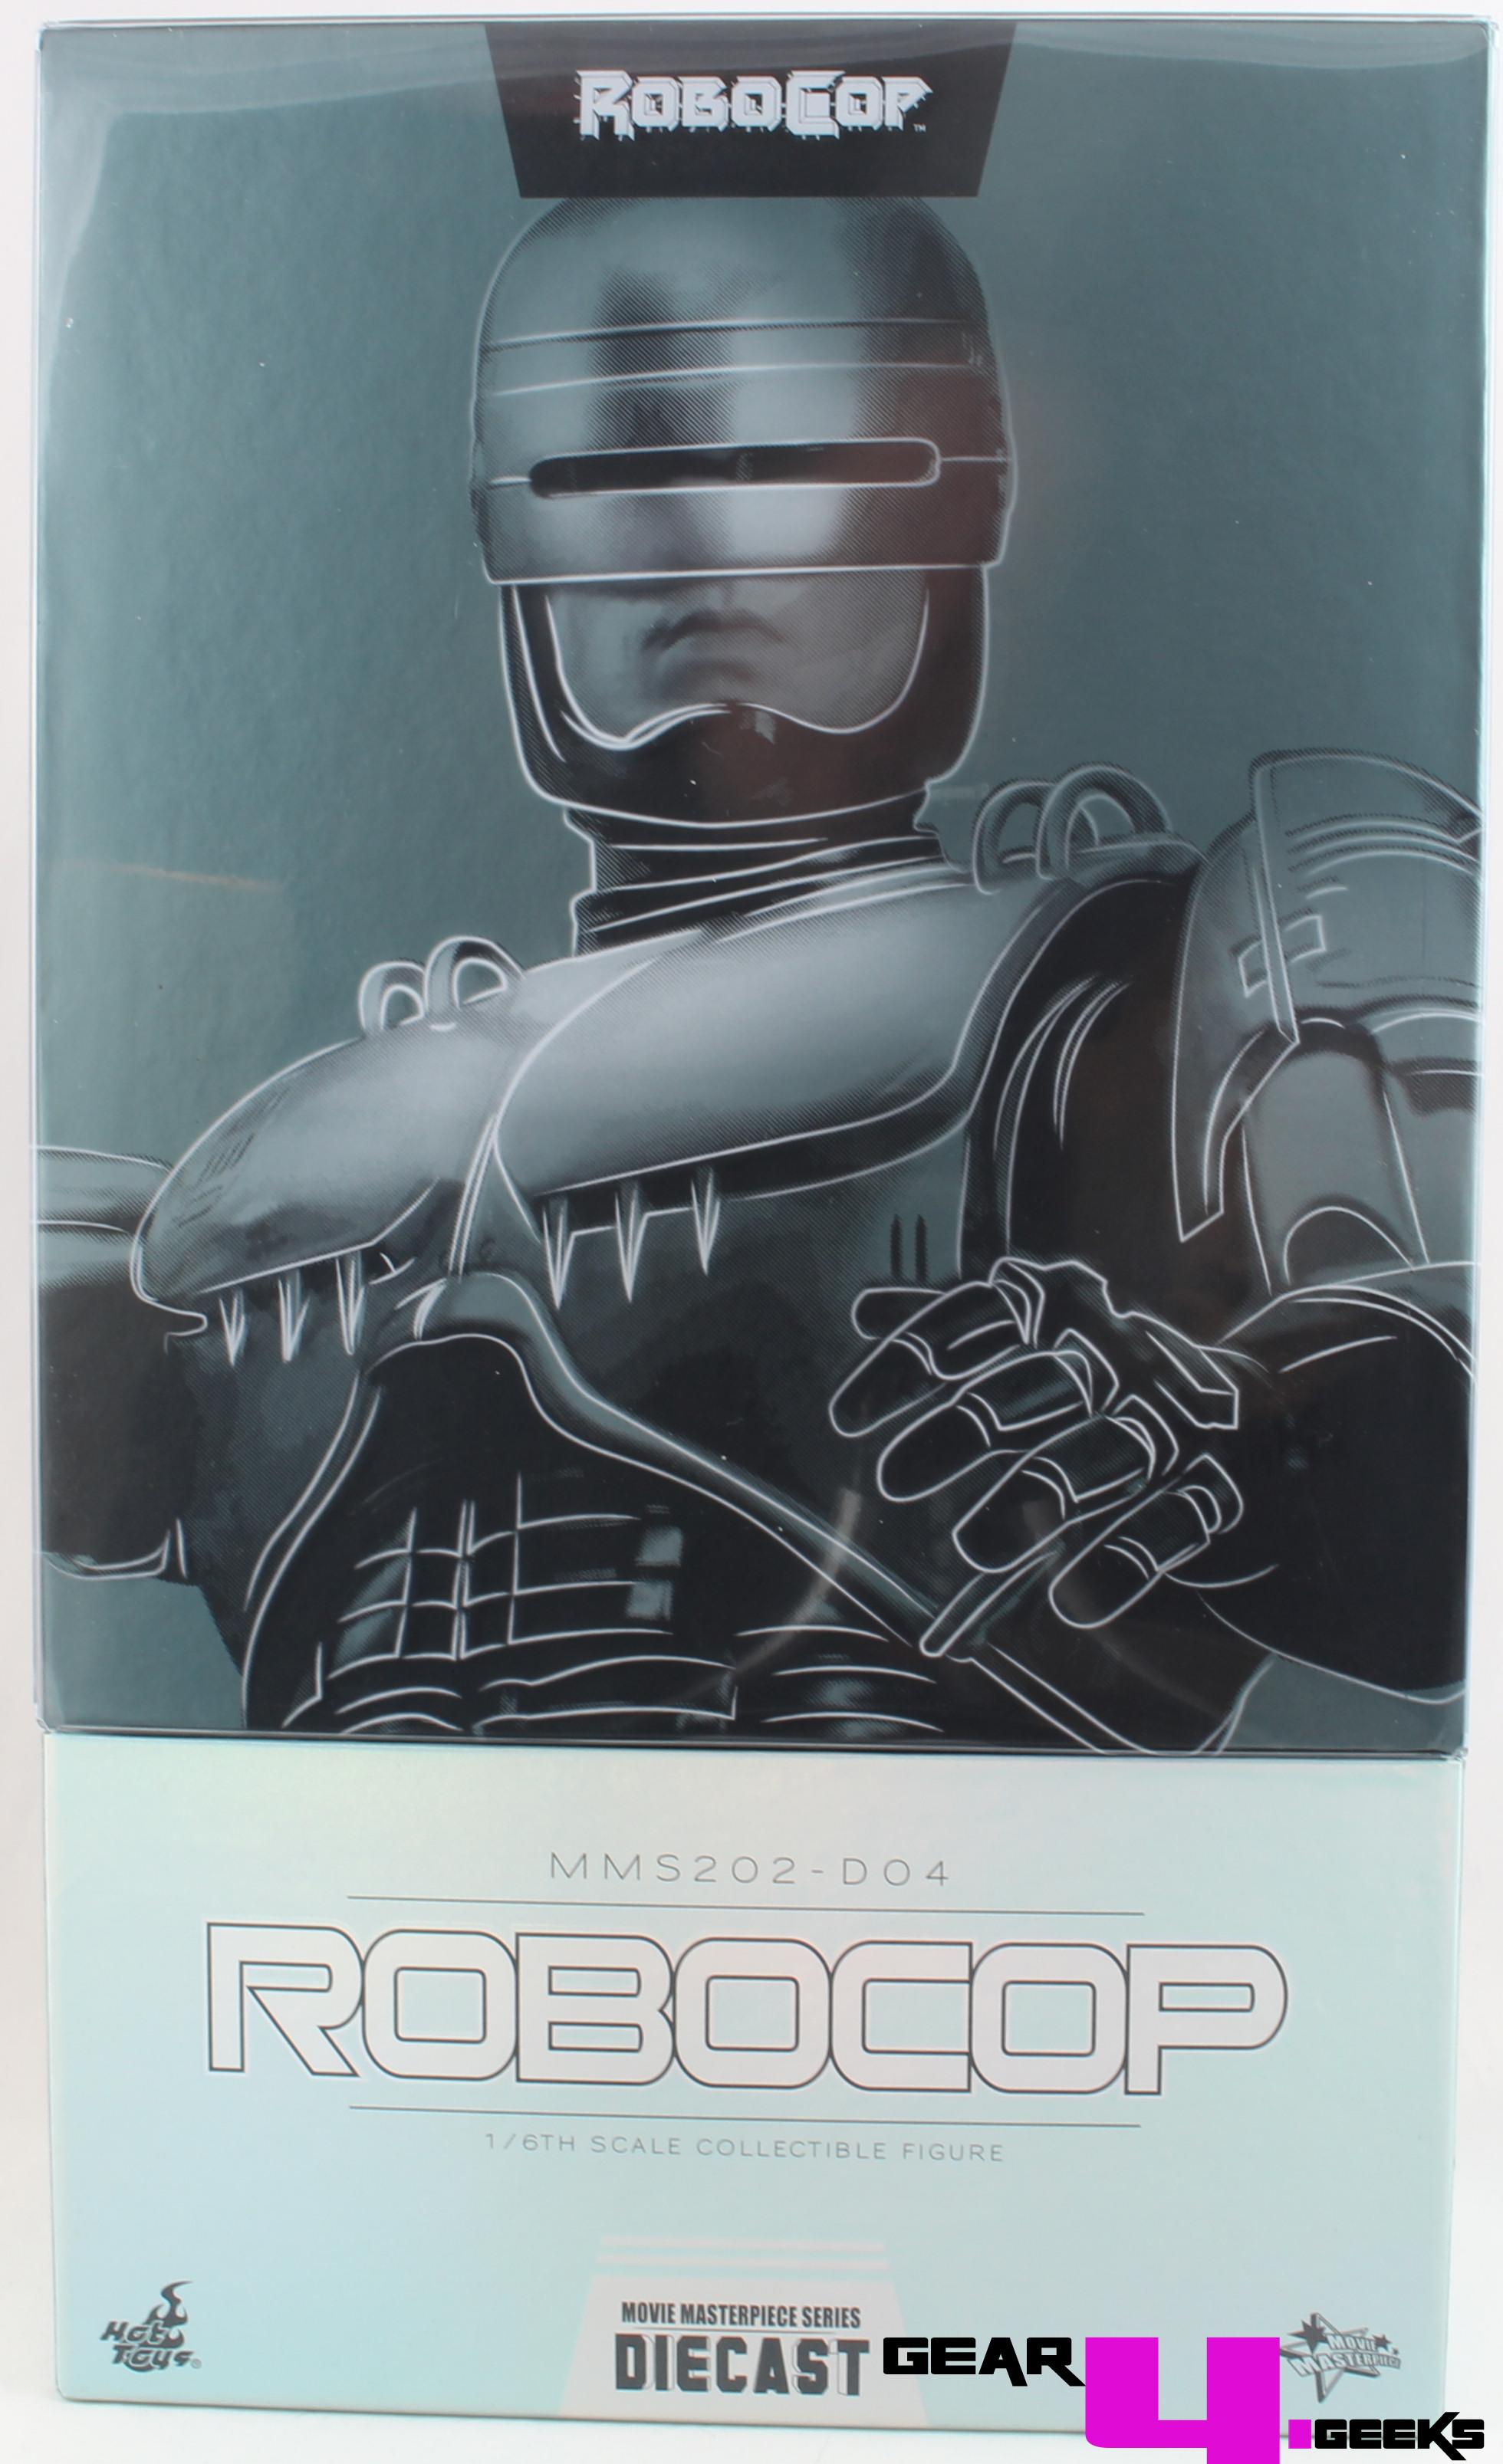 Robocop reviews